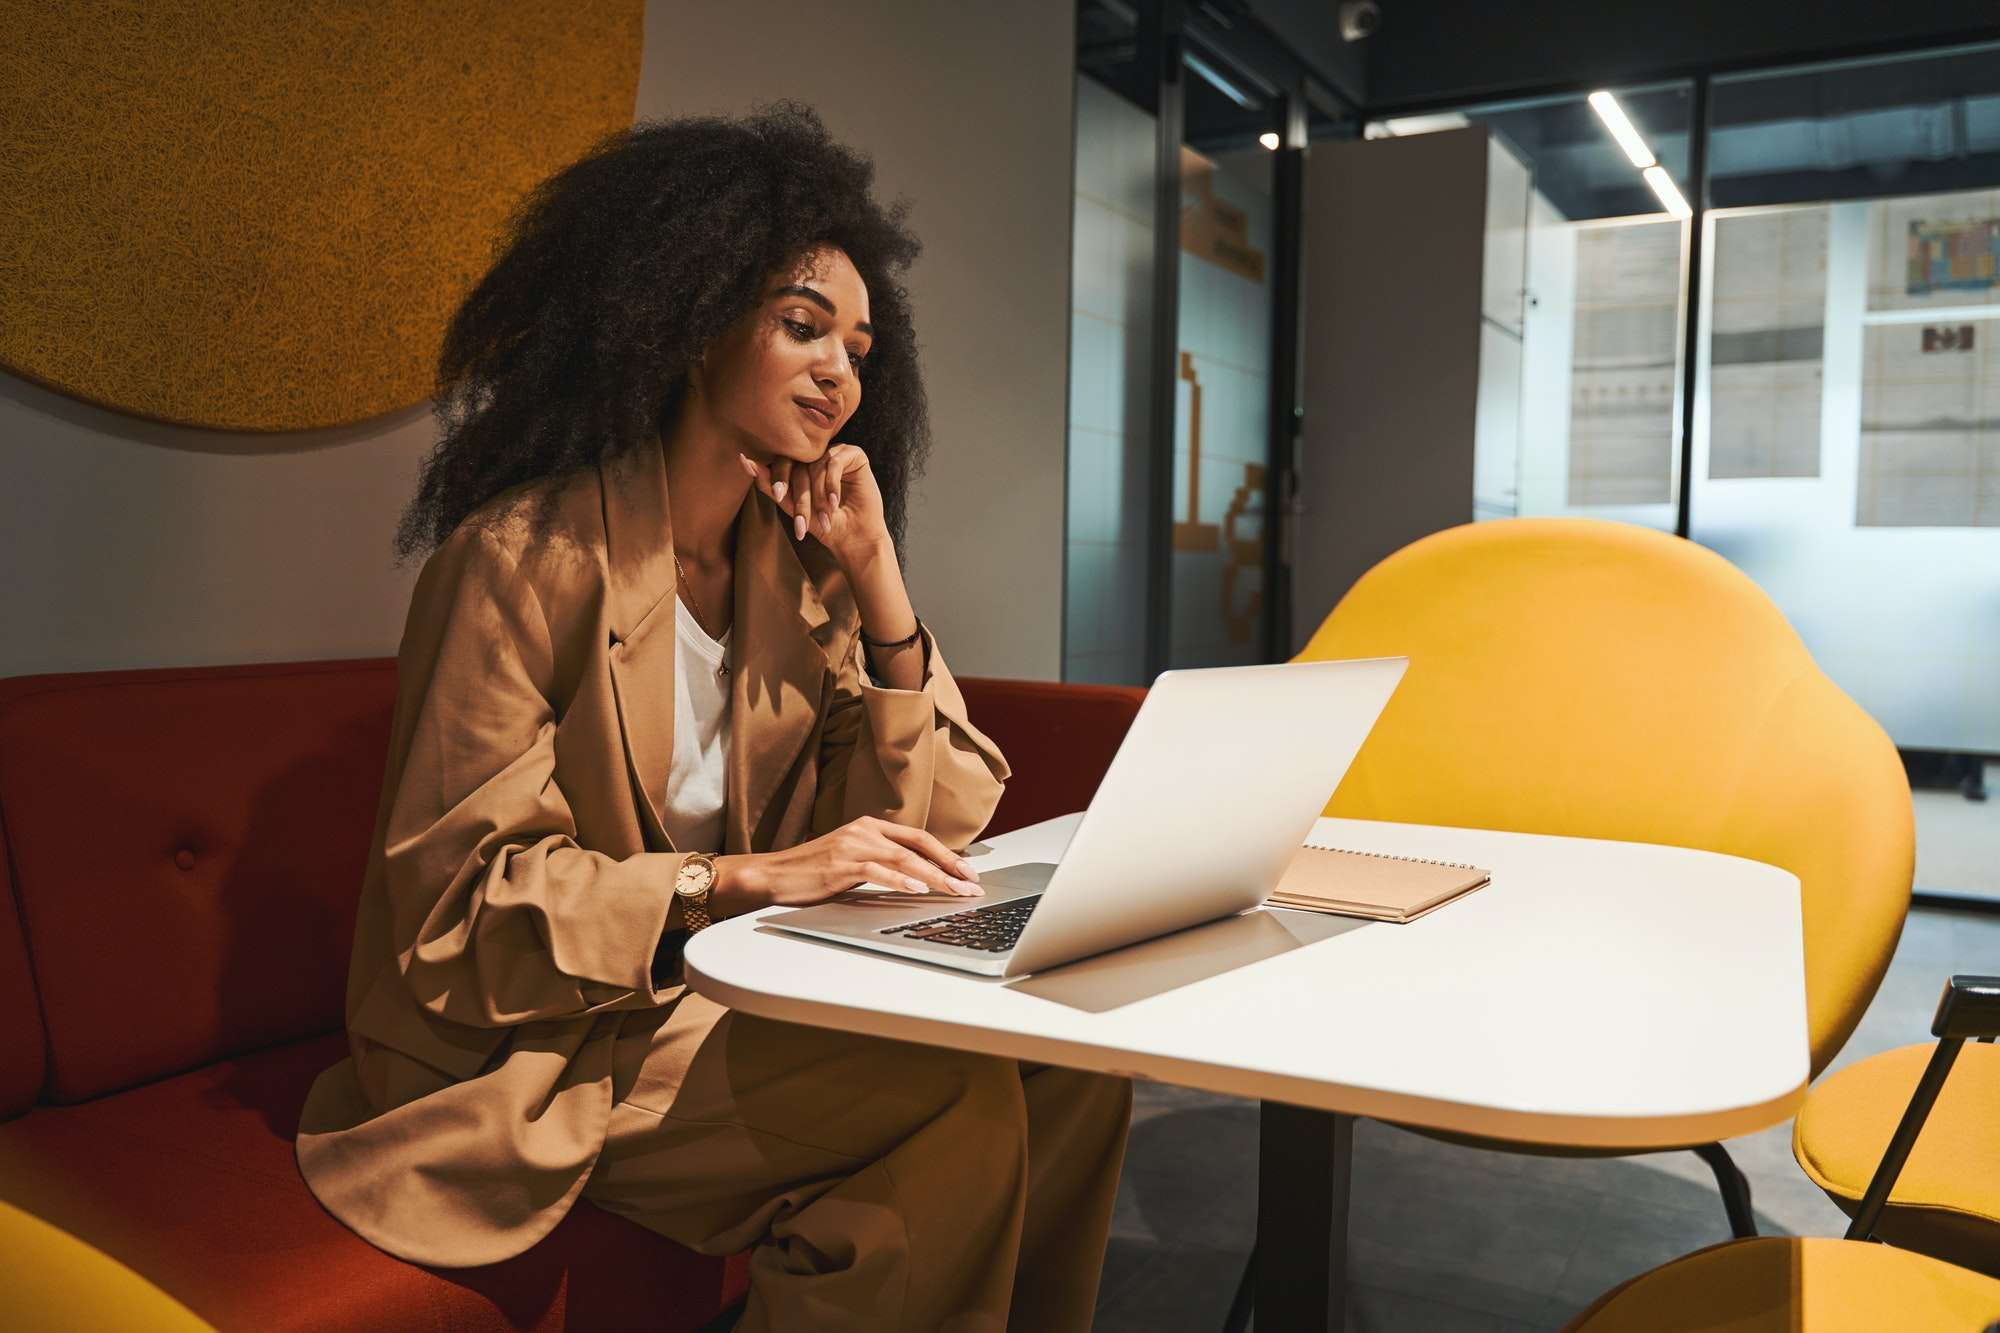 Confident employee working online in coworking center